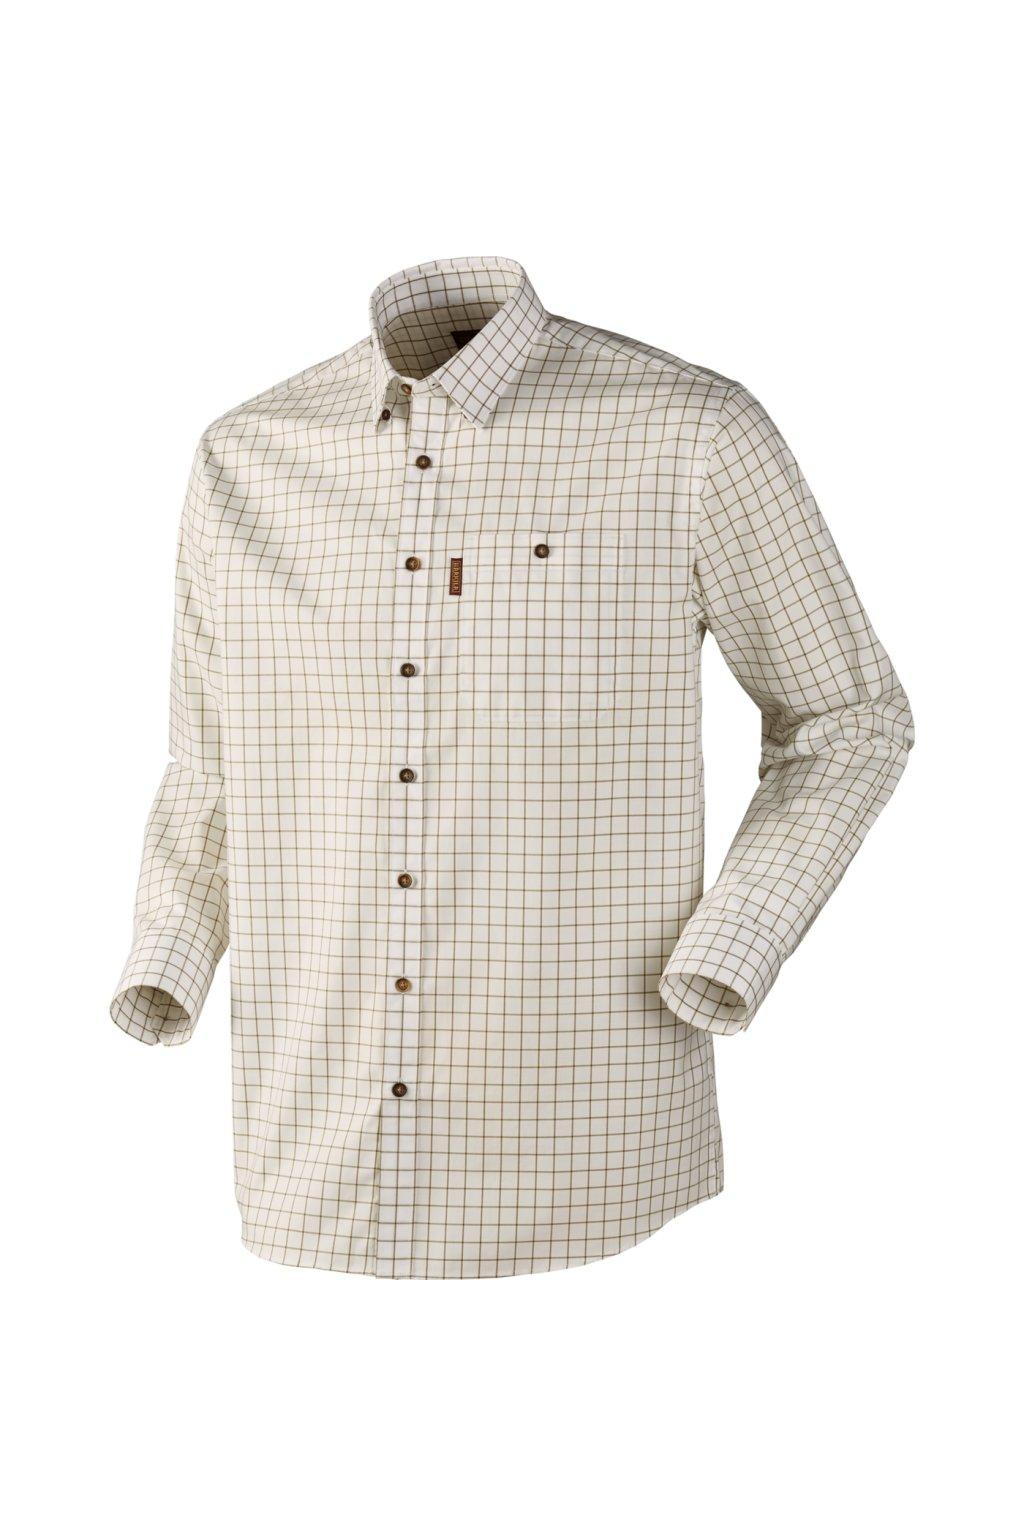 Härkila - Stenstorp skjorte košile s dlouhým rukávem barva oliv/bílá